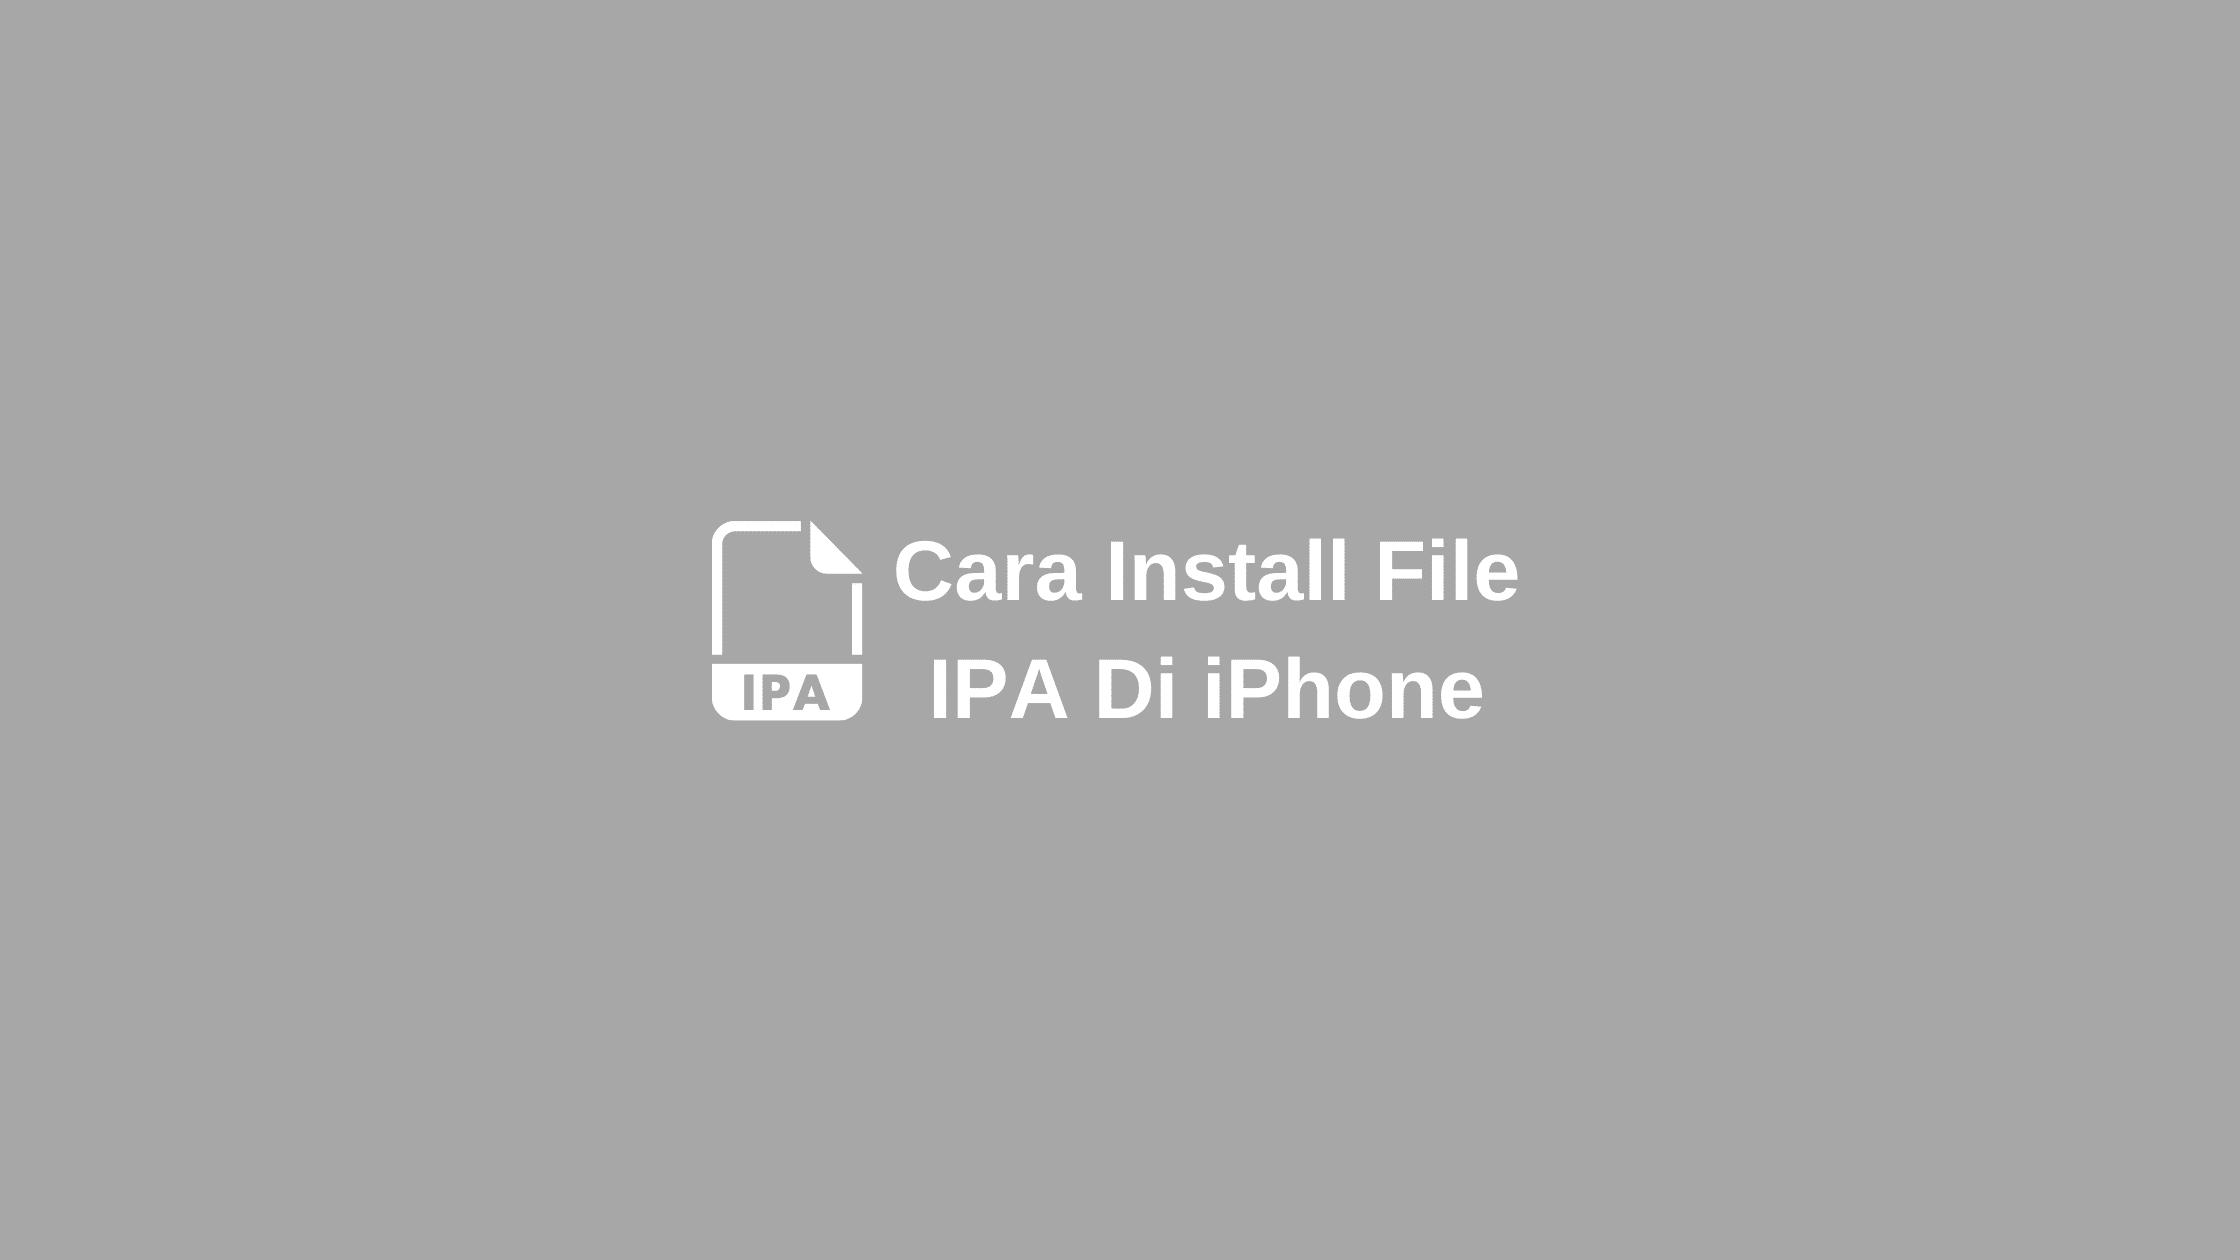 cara install file ipa di iphone